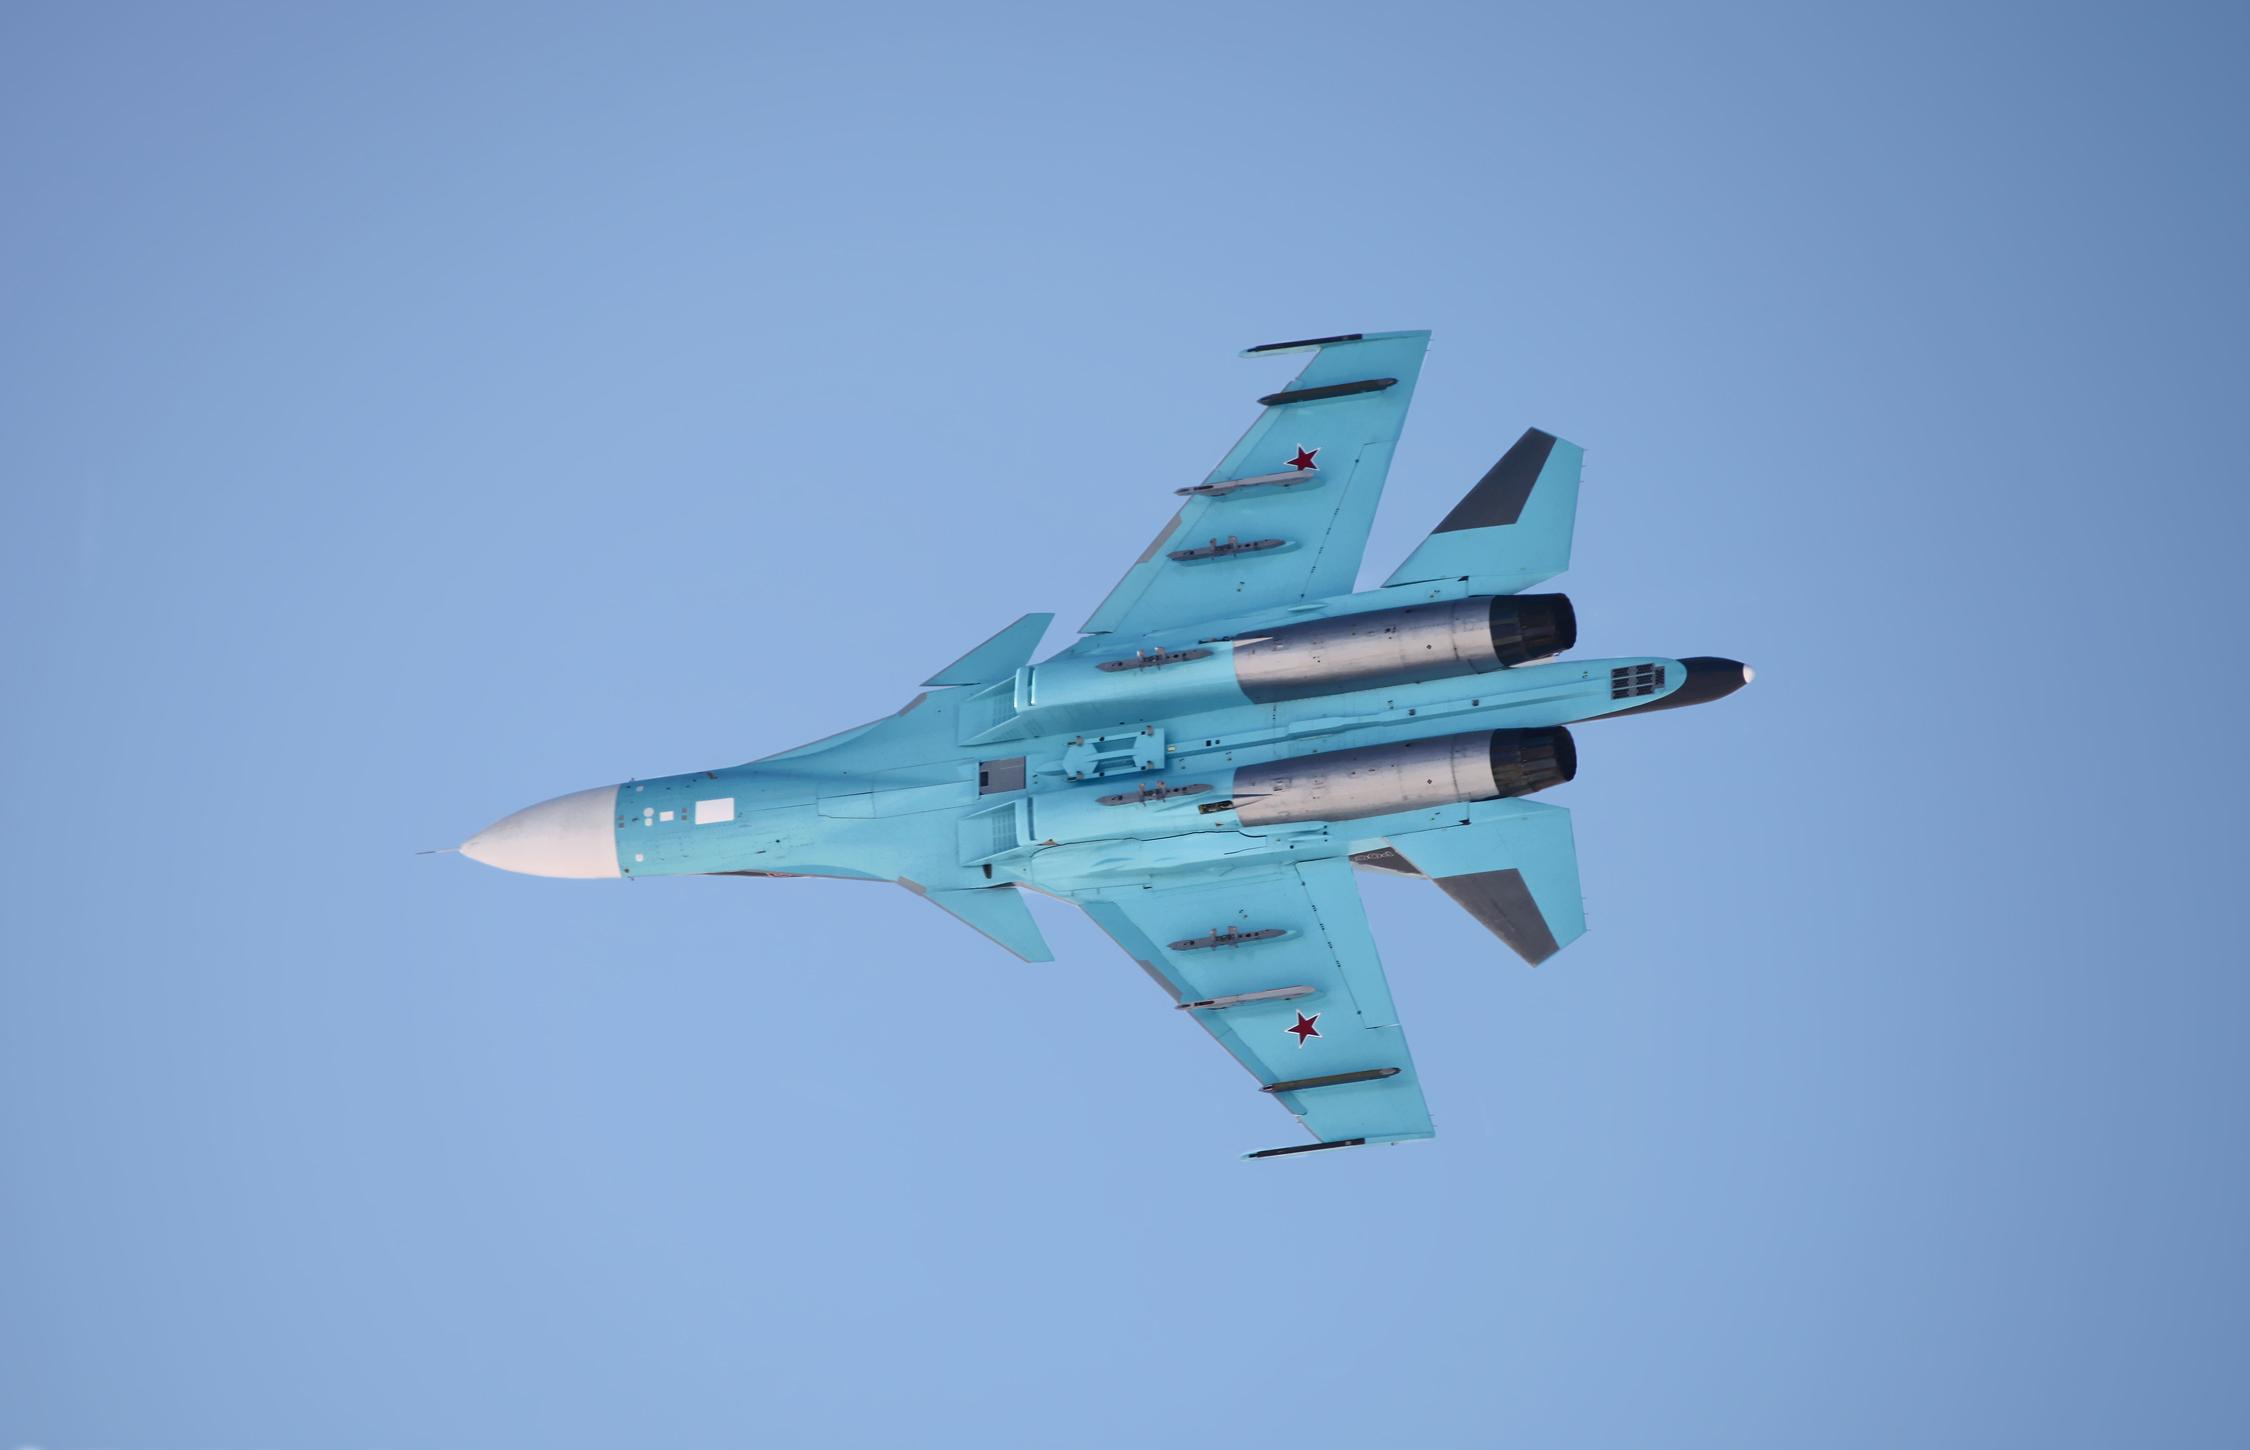 Su 34 (航空機)の画像 p1_36